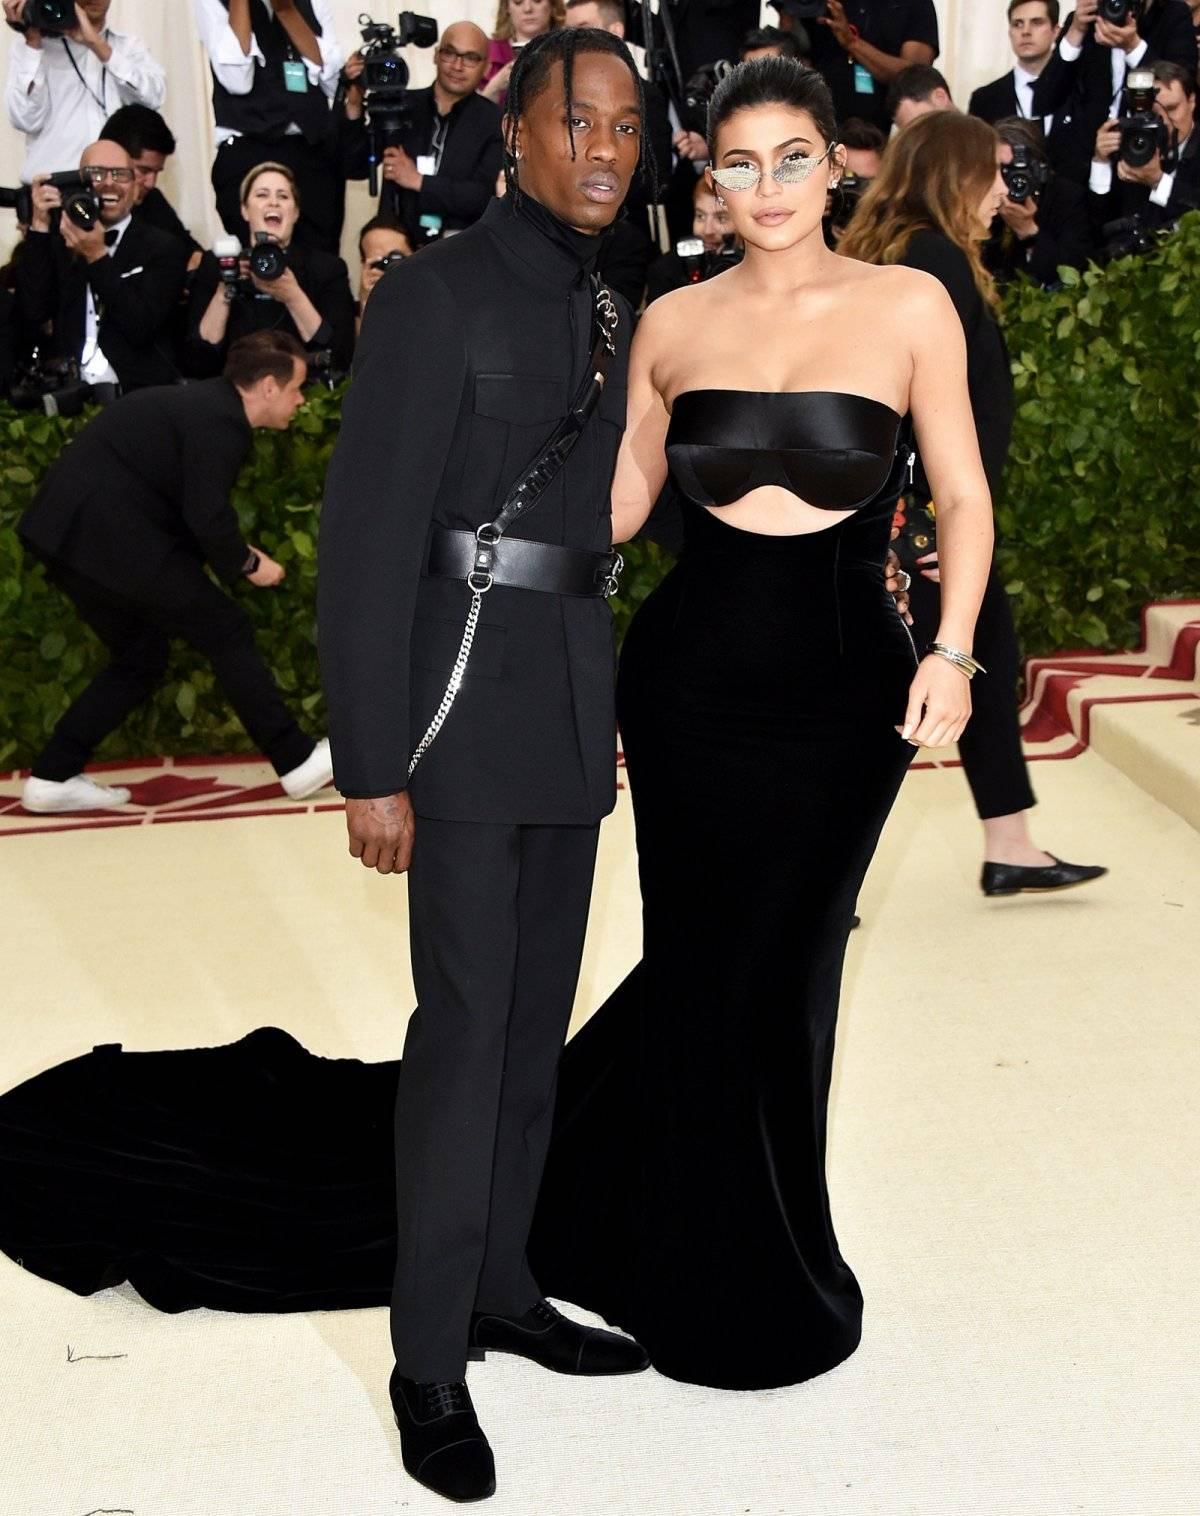 Kylie Jenner Travis Scott Met Gala 2018